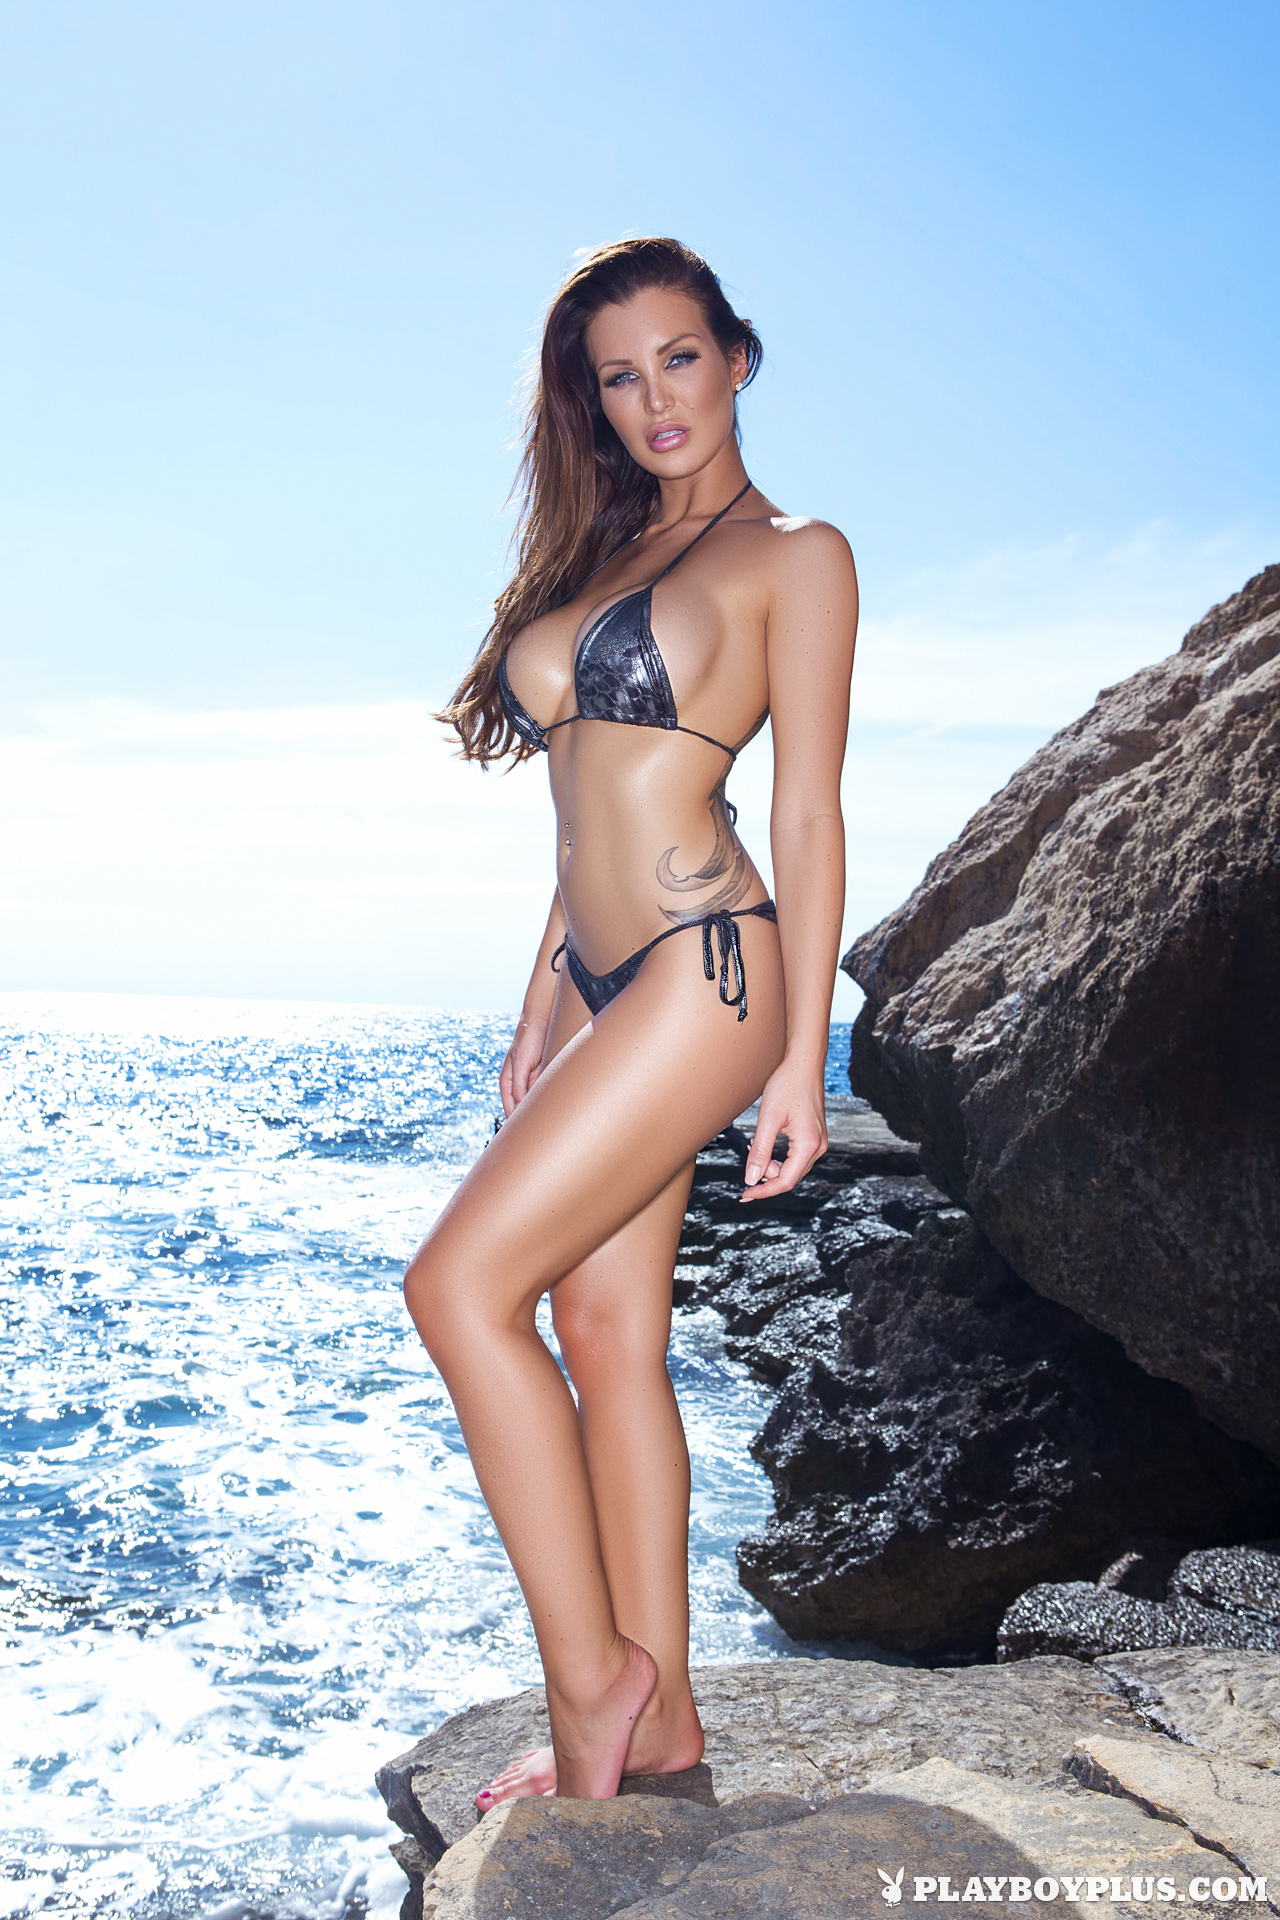 Helen de Muro in a bikini